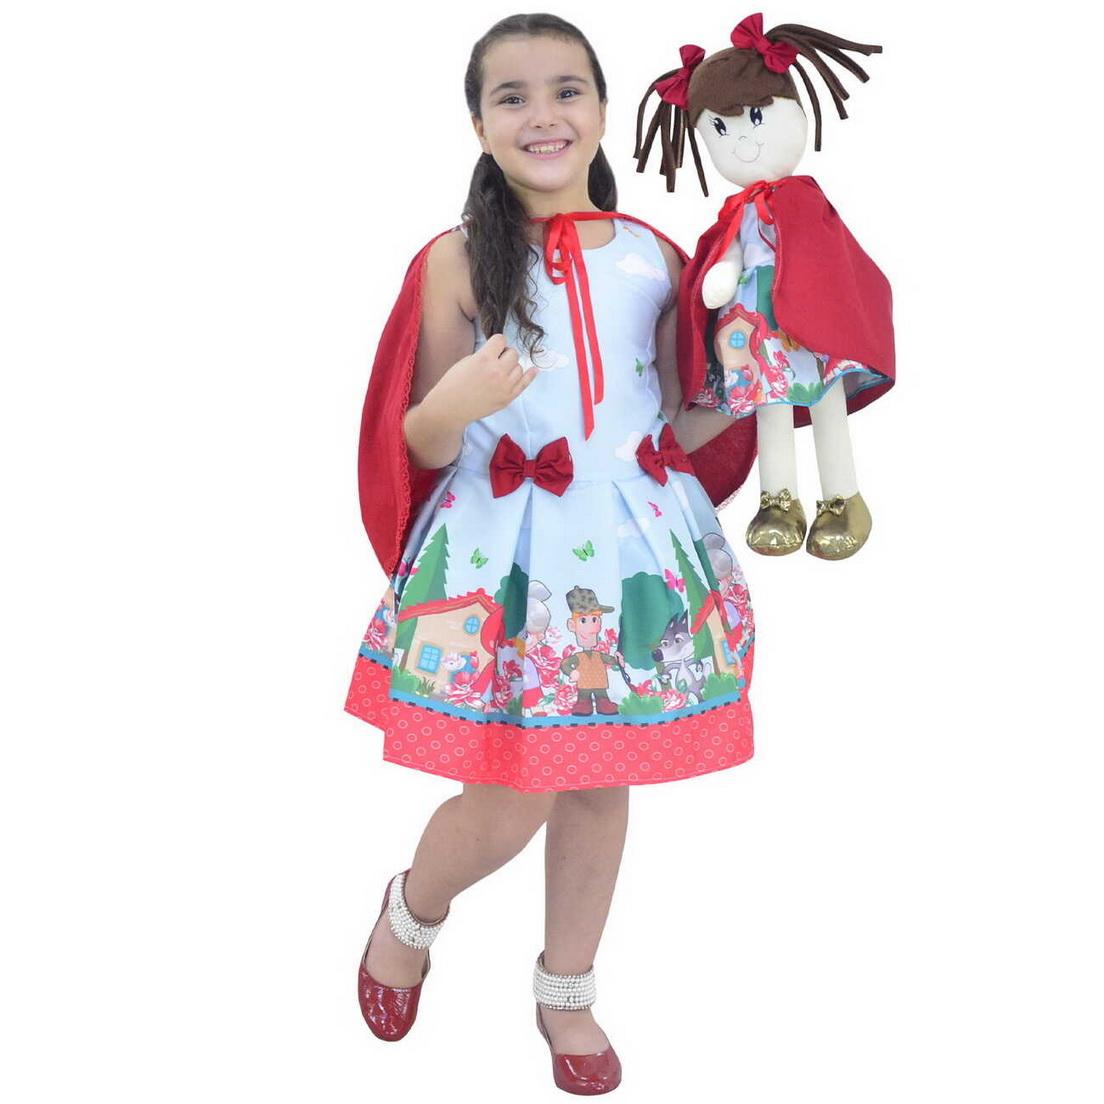 Tal Menina Tal Boneca Mari - Chapeuzinho Vermelho Com Capa